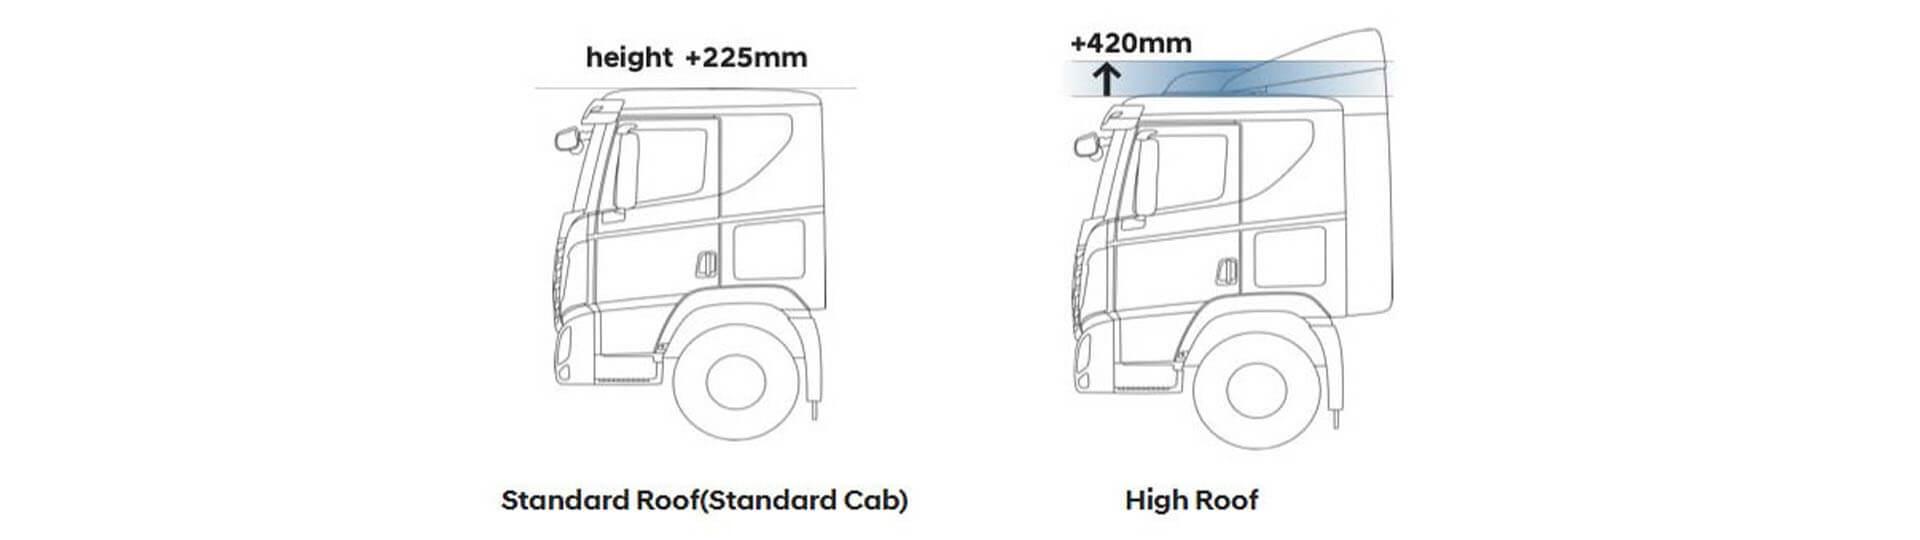 Cab Variants